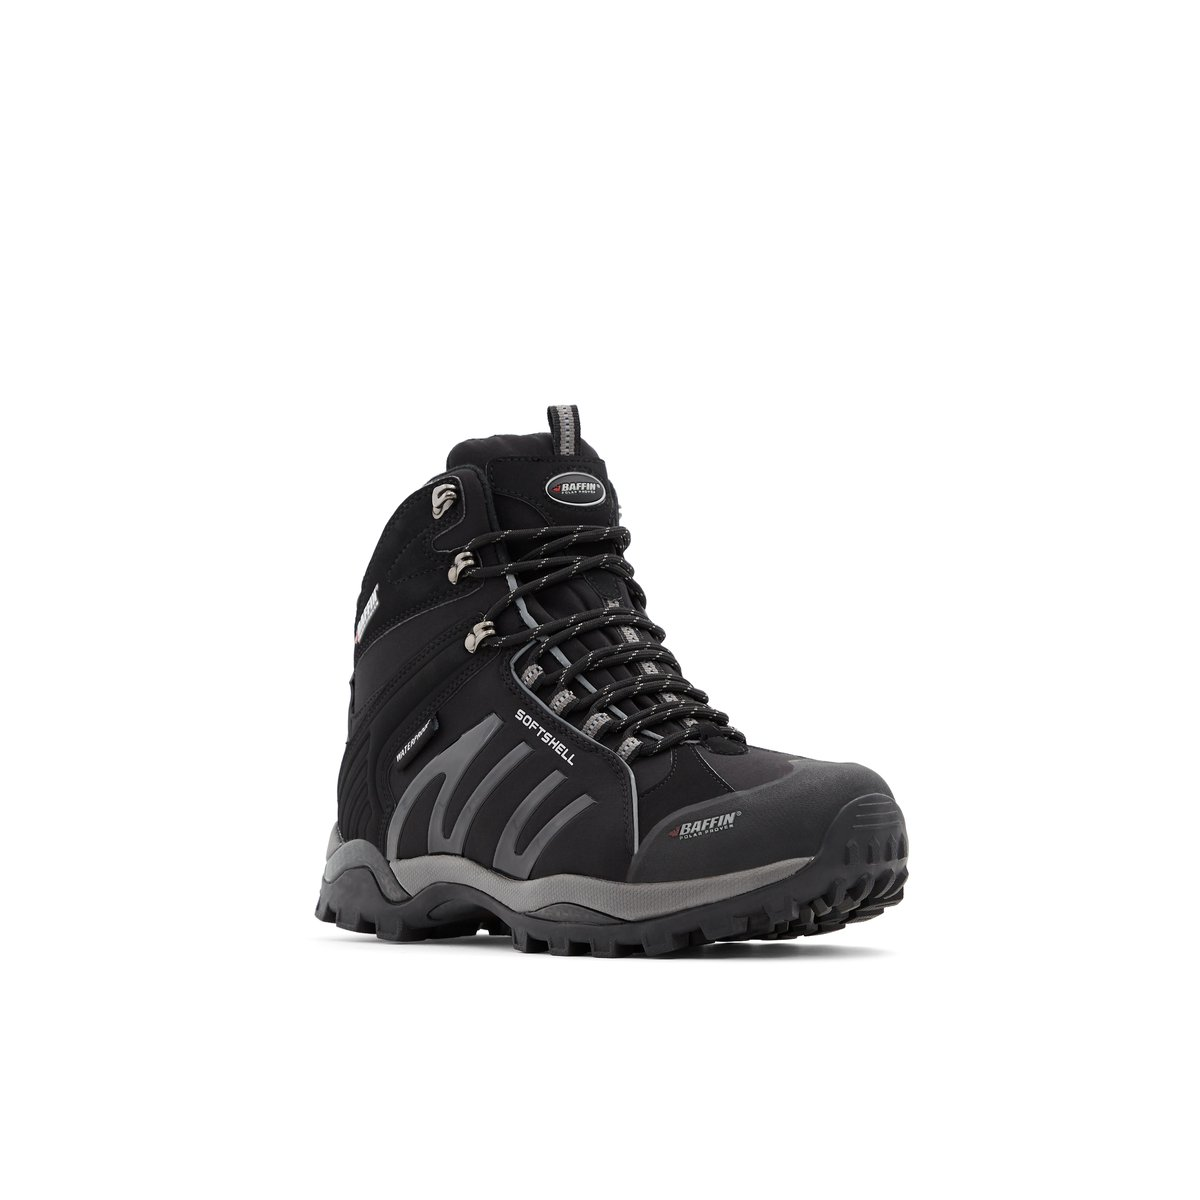 Zone-m Black Men's Winter Boots | Globo Canada